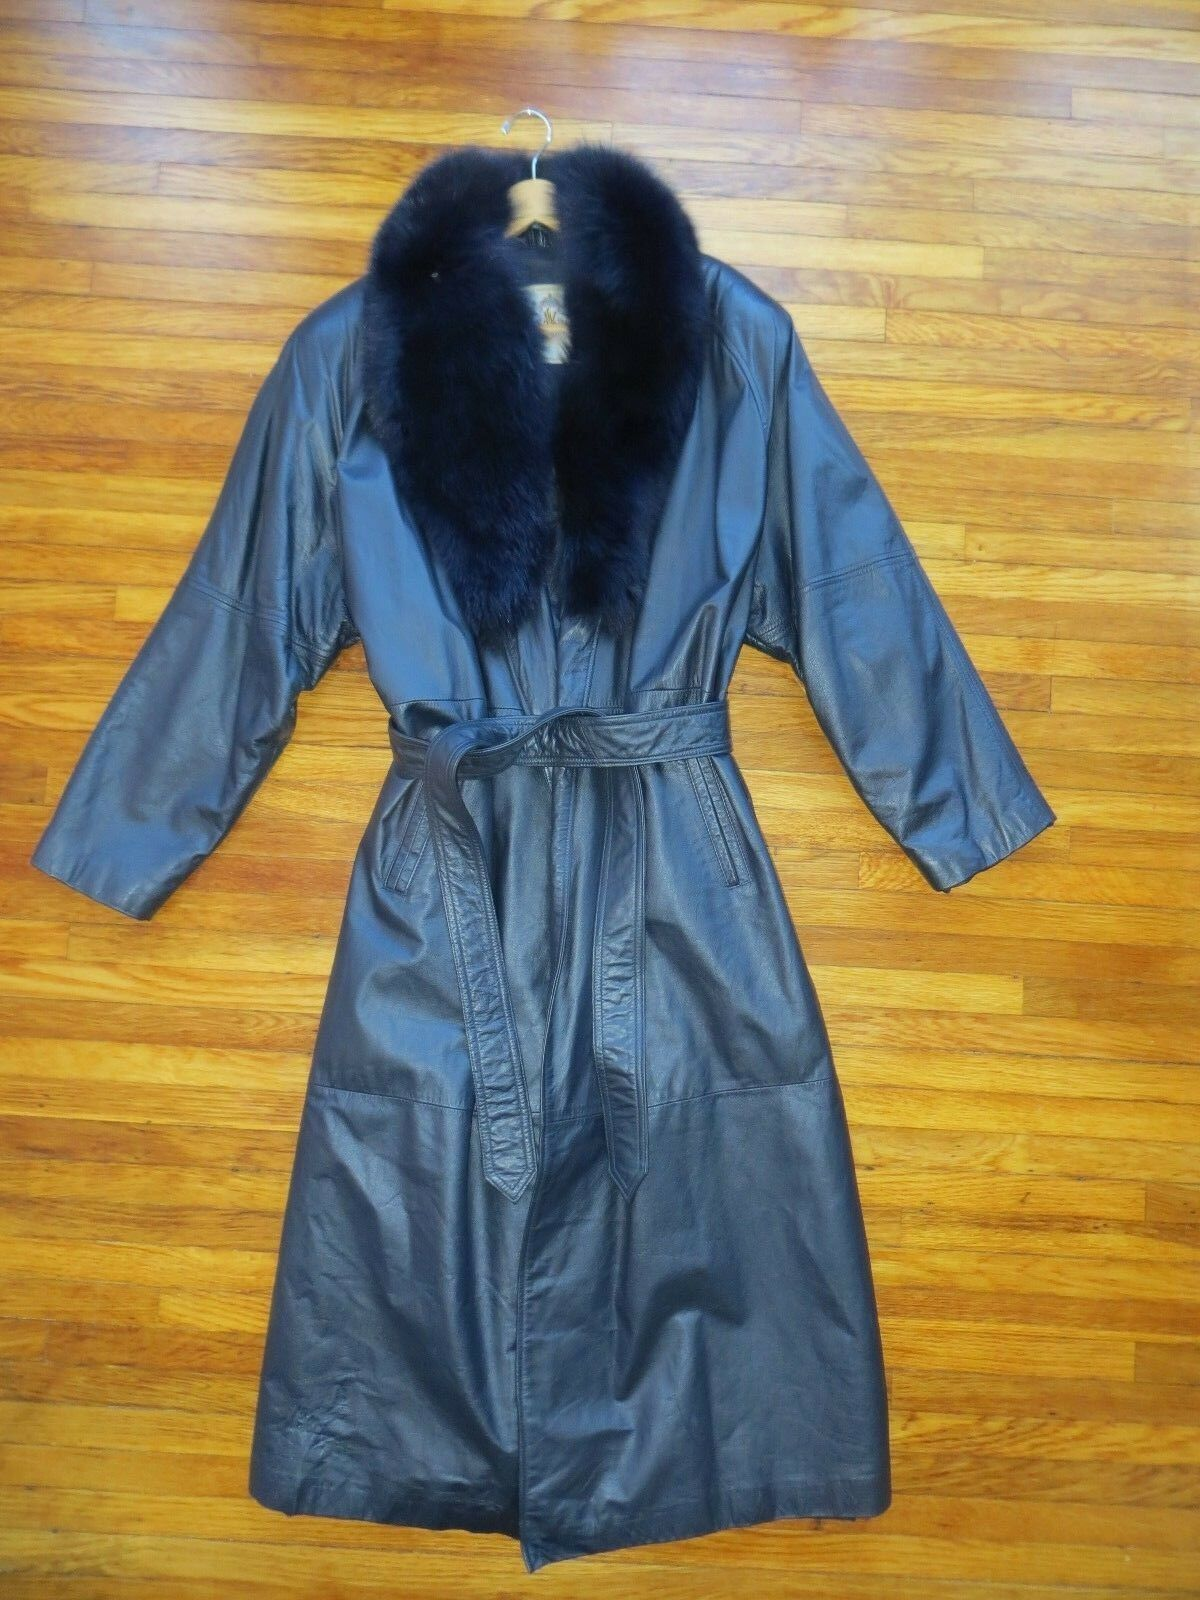 Laura Winston Mujeres Cuero Chaqueta Abrigo  Largo Azul Marino Azul Púrpura Grande de Piel de Zorro  entrega gratis